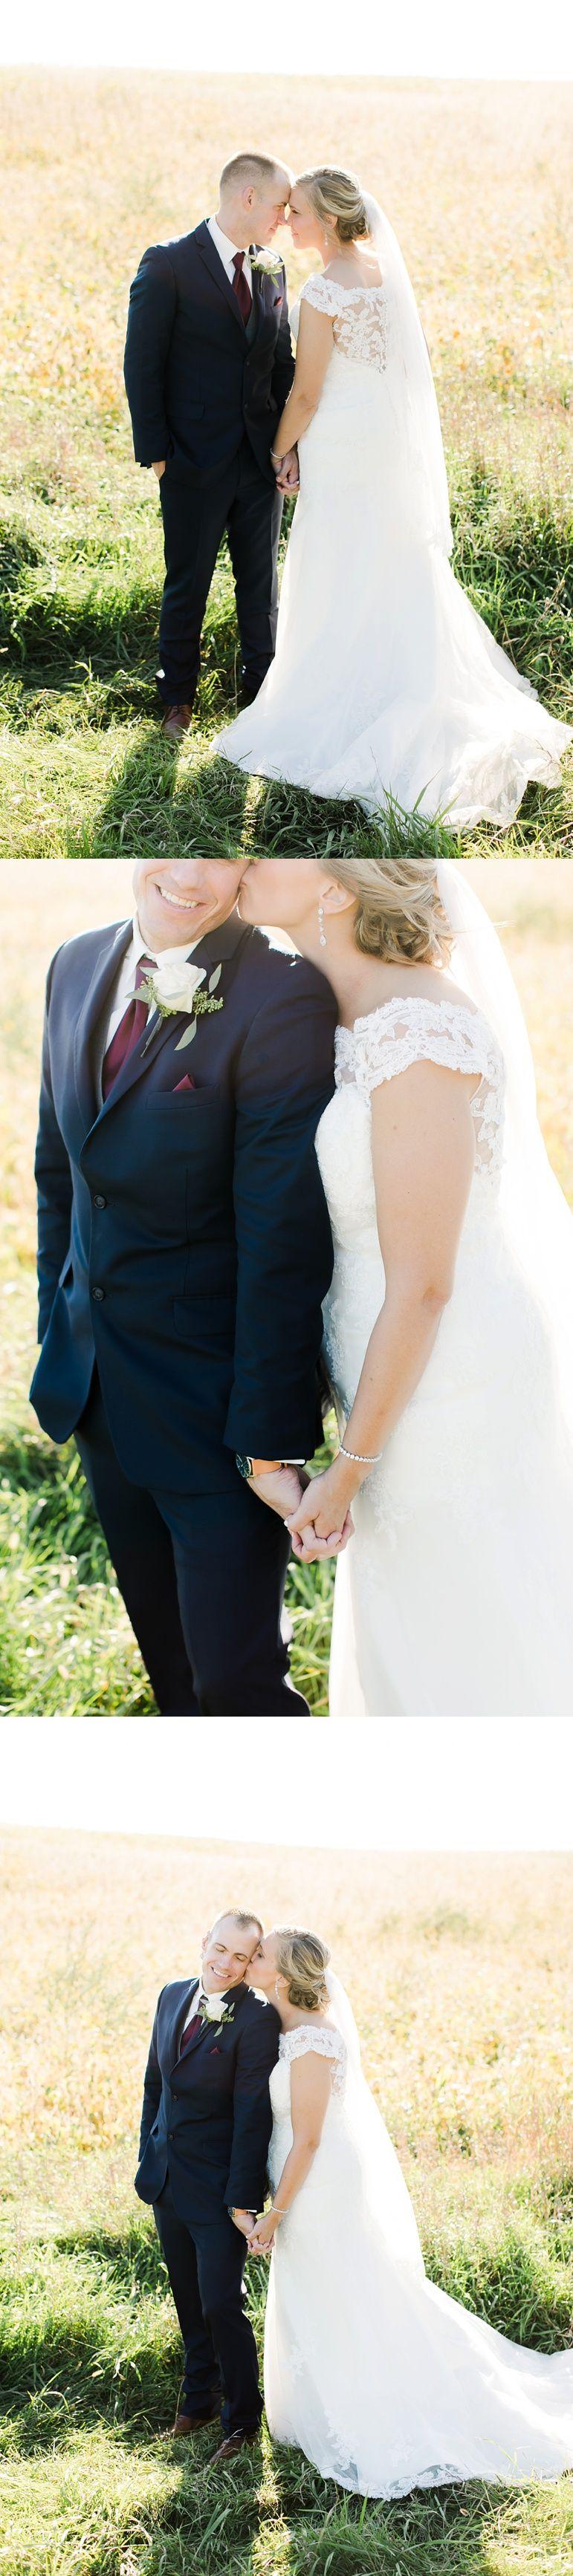 Sepia Wedding Chapel Two Rivers Wi Wedding With Images Chapel Wedding Bay Wedding Wedding